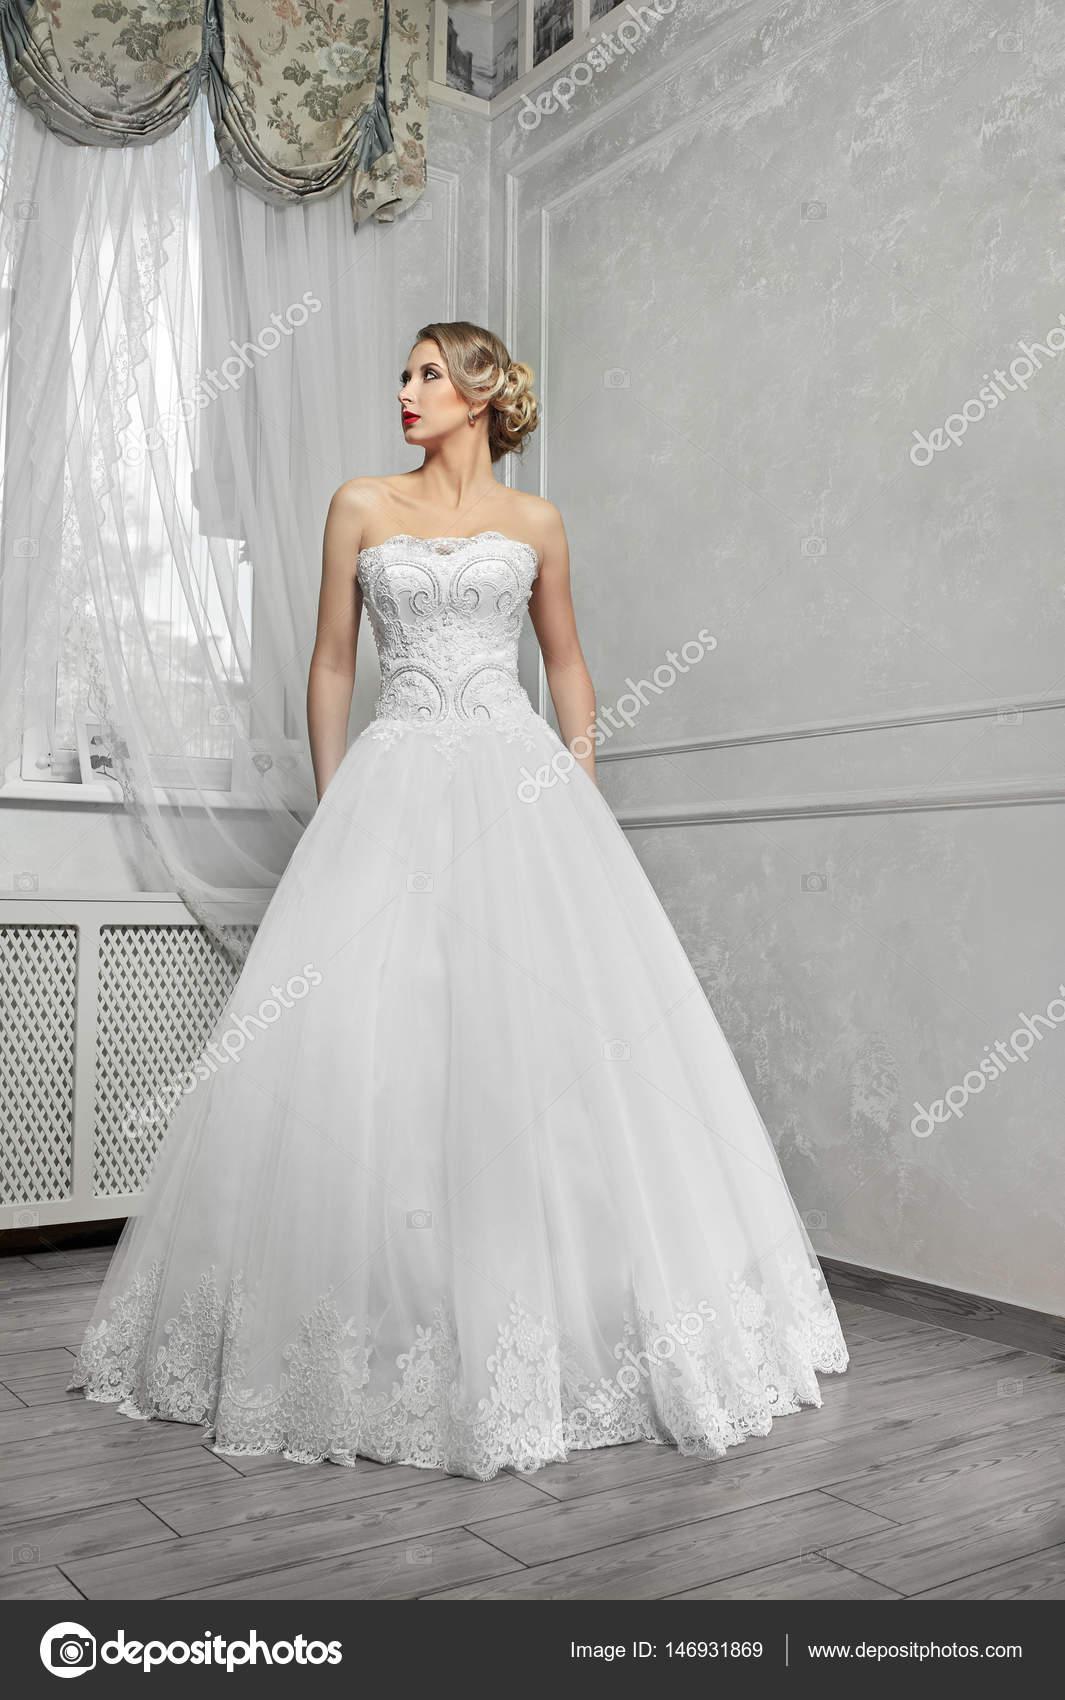 Vestidos de boda blanco largo